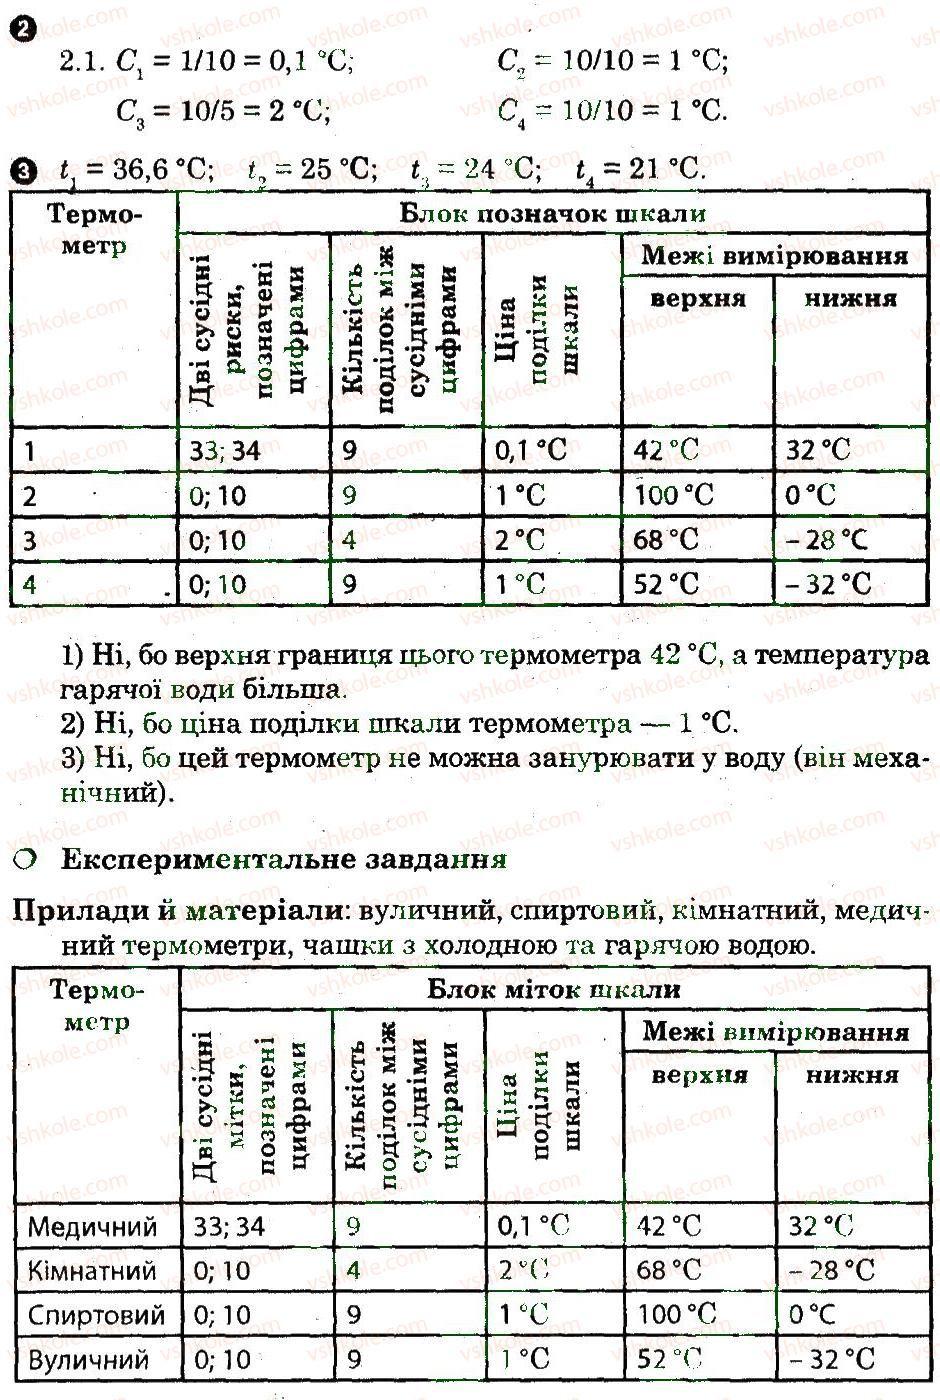 8-fizika-fya-bozhinova-oo-kiryuhina-2010-zoshit-dlya-laboratornih-robit--laboratorni-roboti-11-rnd8917.jpg